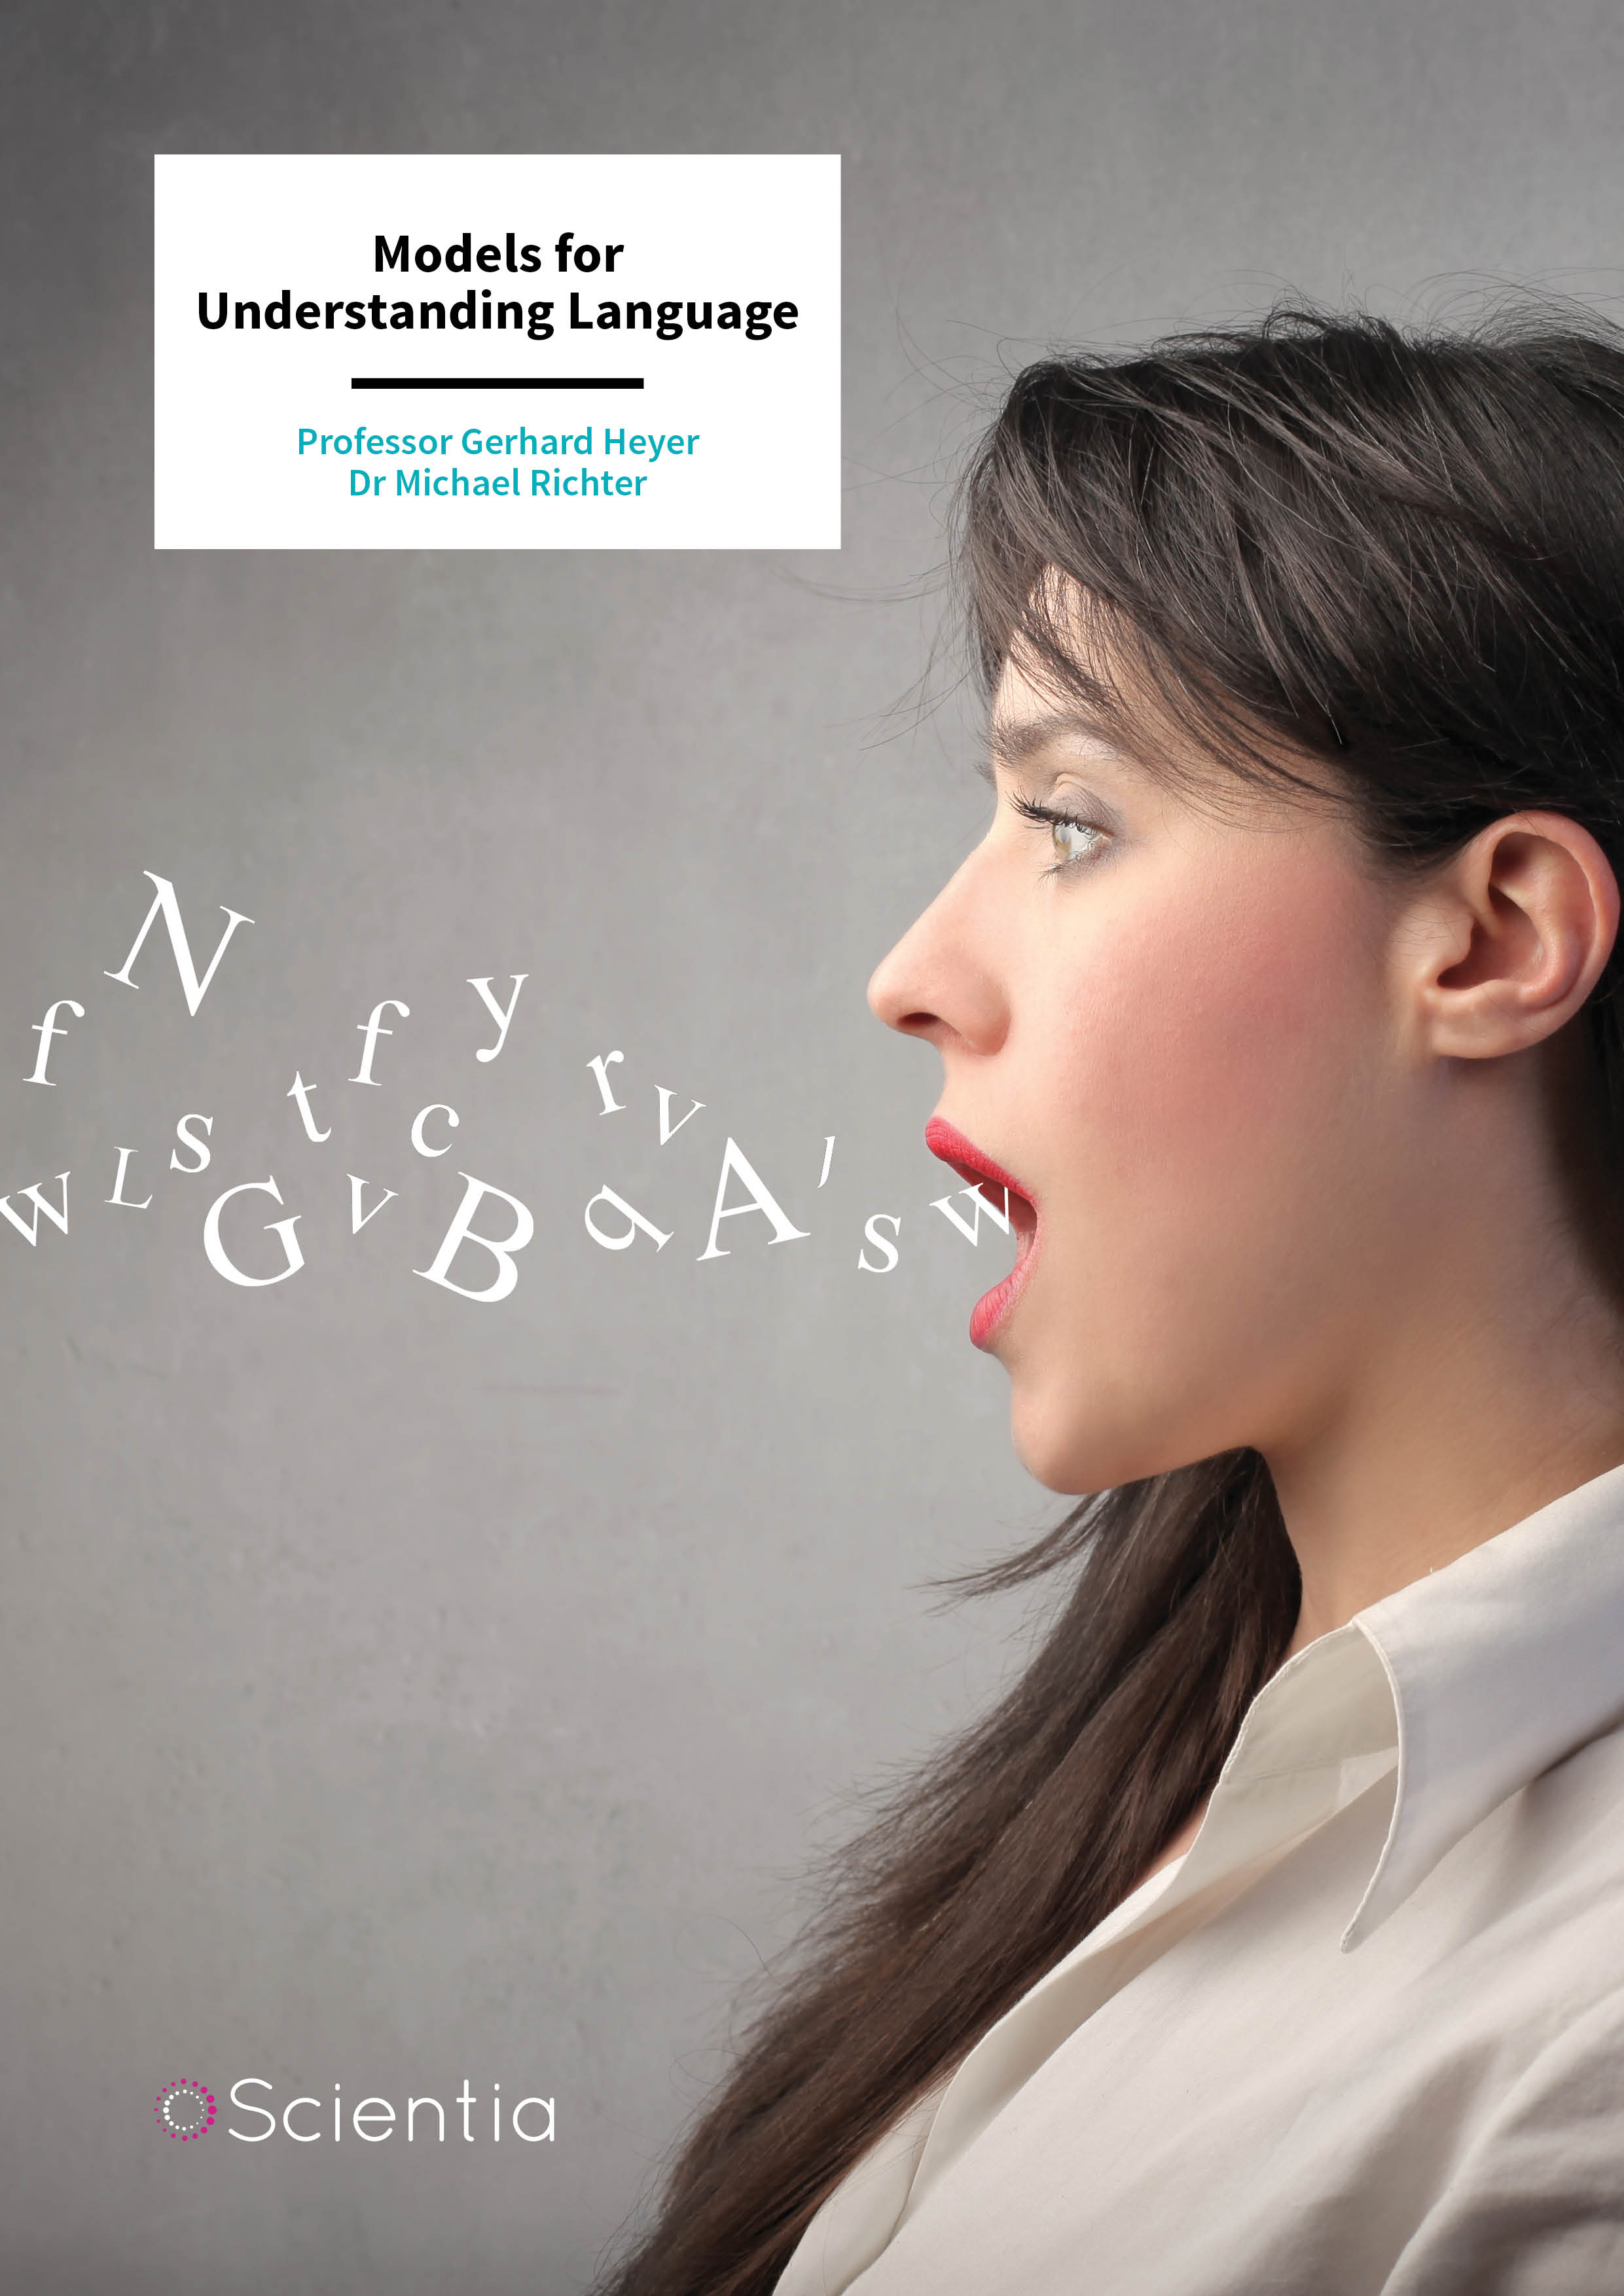 Professor Gerhard Heyer | Dr Michael Richter – Models for Understanding Language